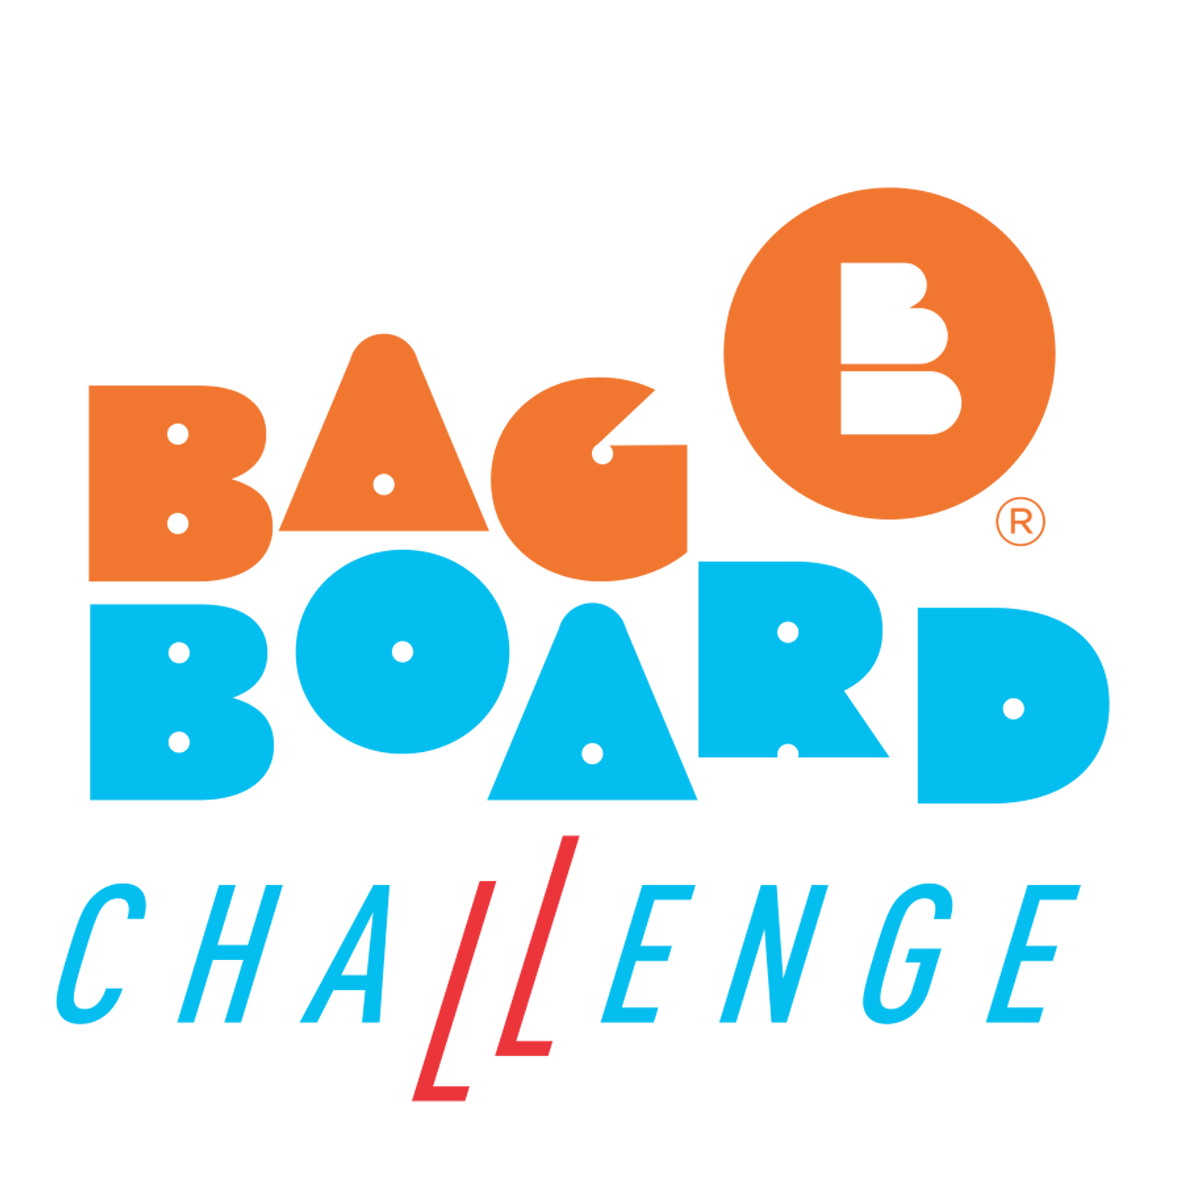 logo bagboard jeu bois Challenge